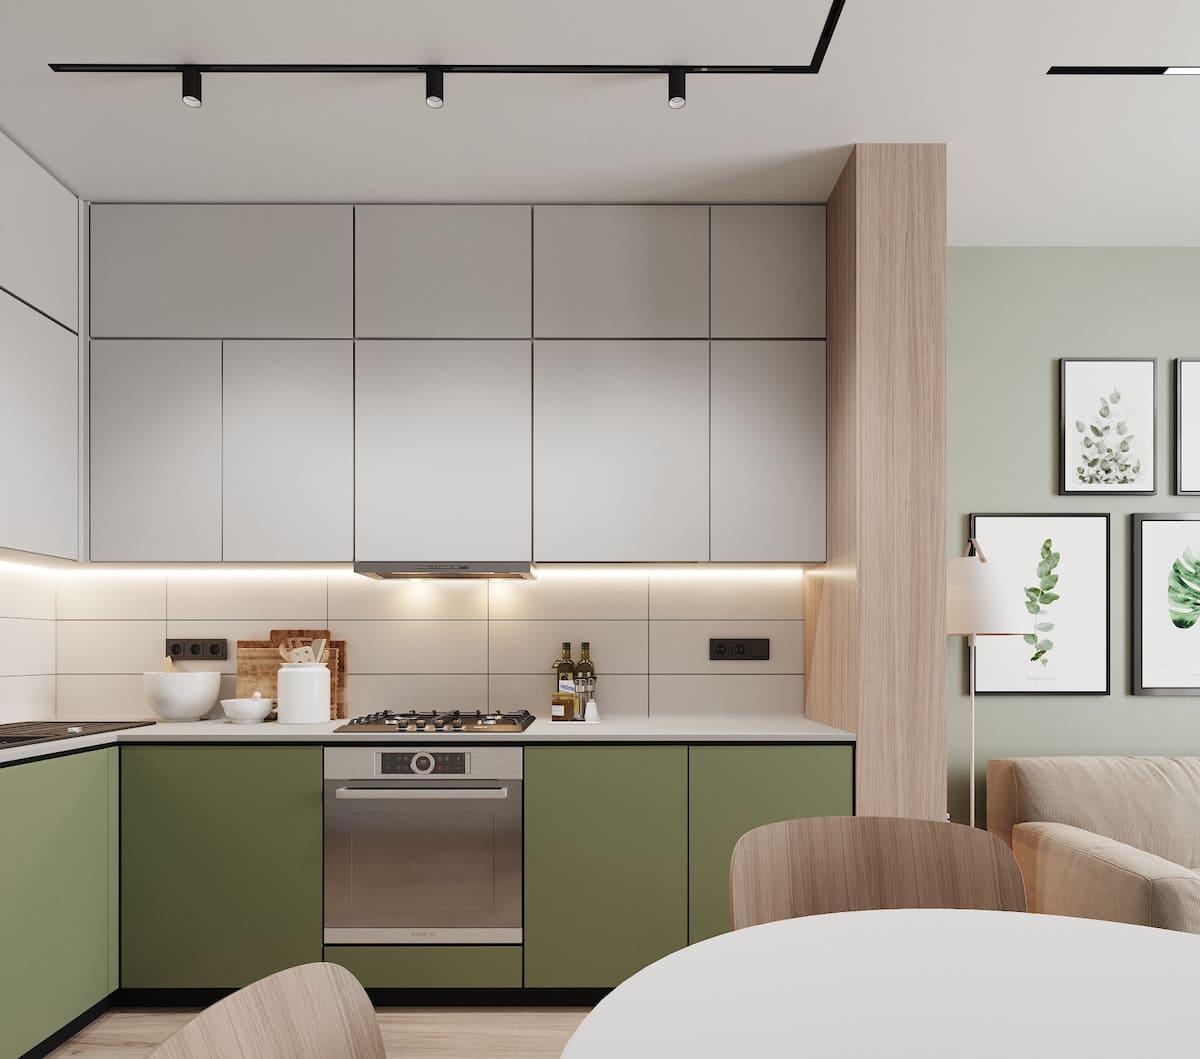 дизайн интерьера модной квартиры фото 89